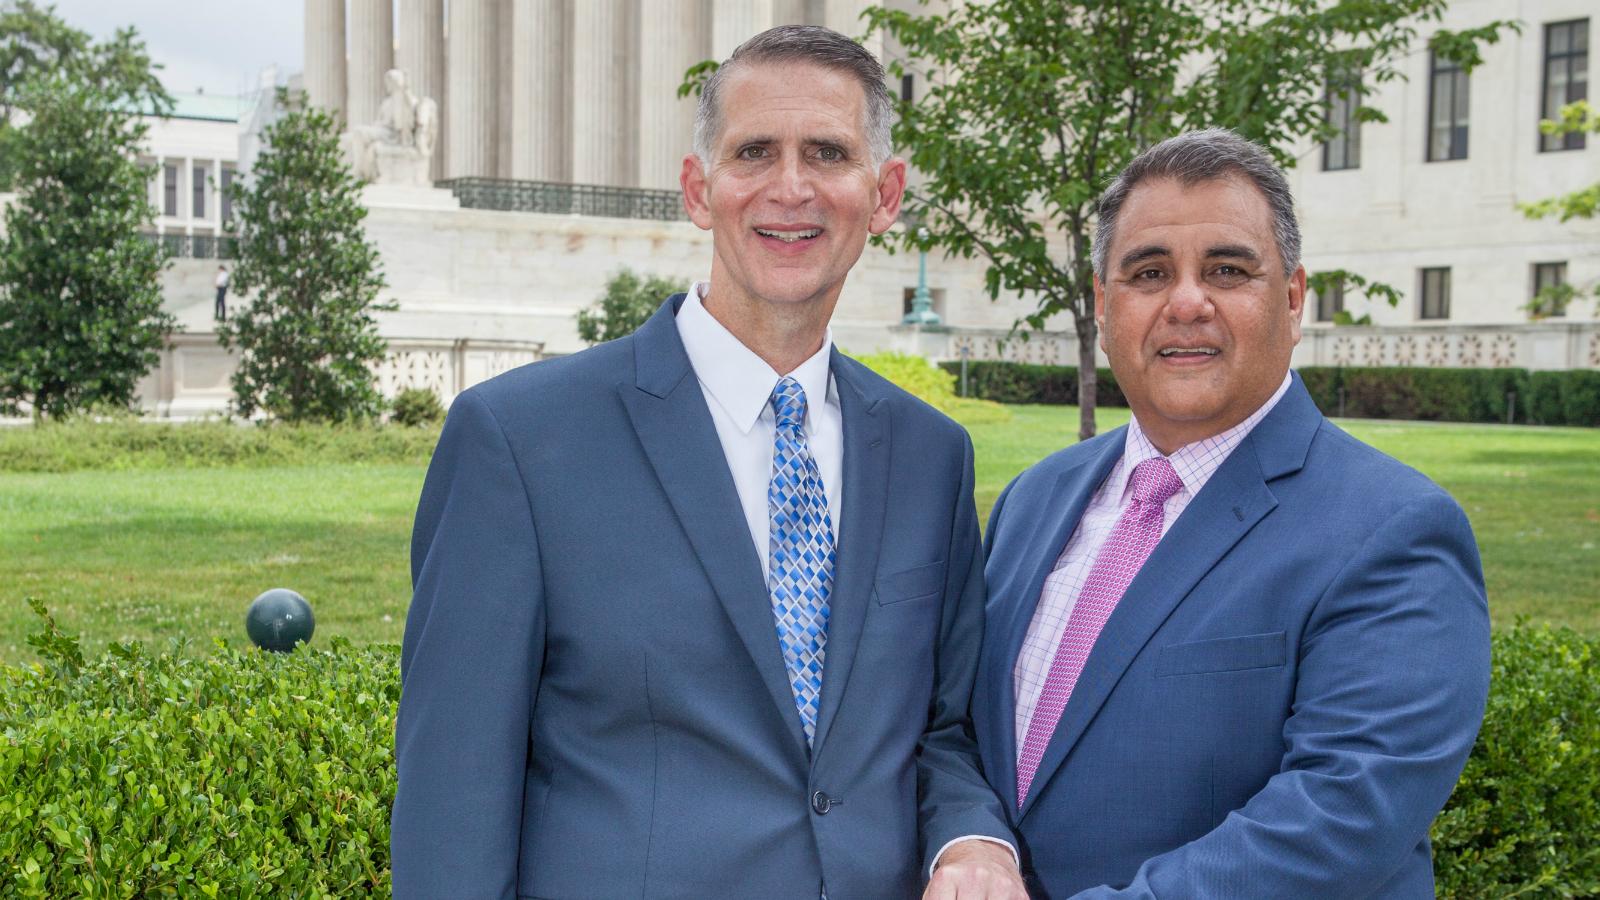 Plaintiff in SCOTUS Marriage Equality Case to Lead Pilgrimage to Celebrate LGBTQ Catholics